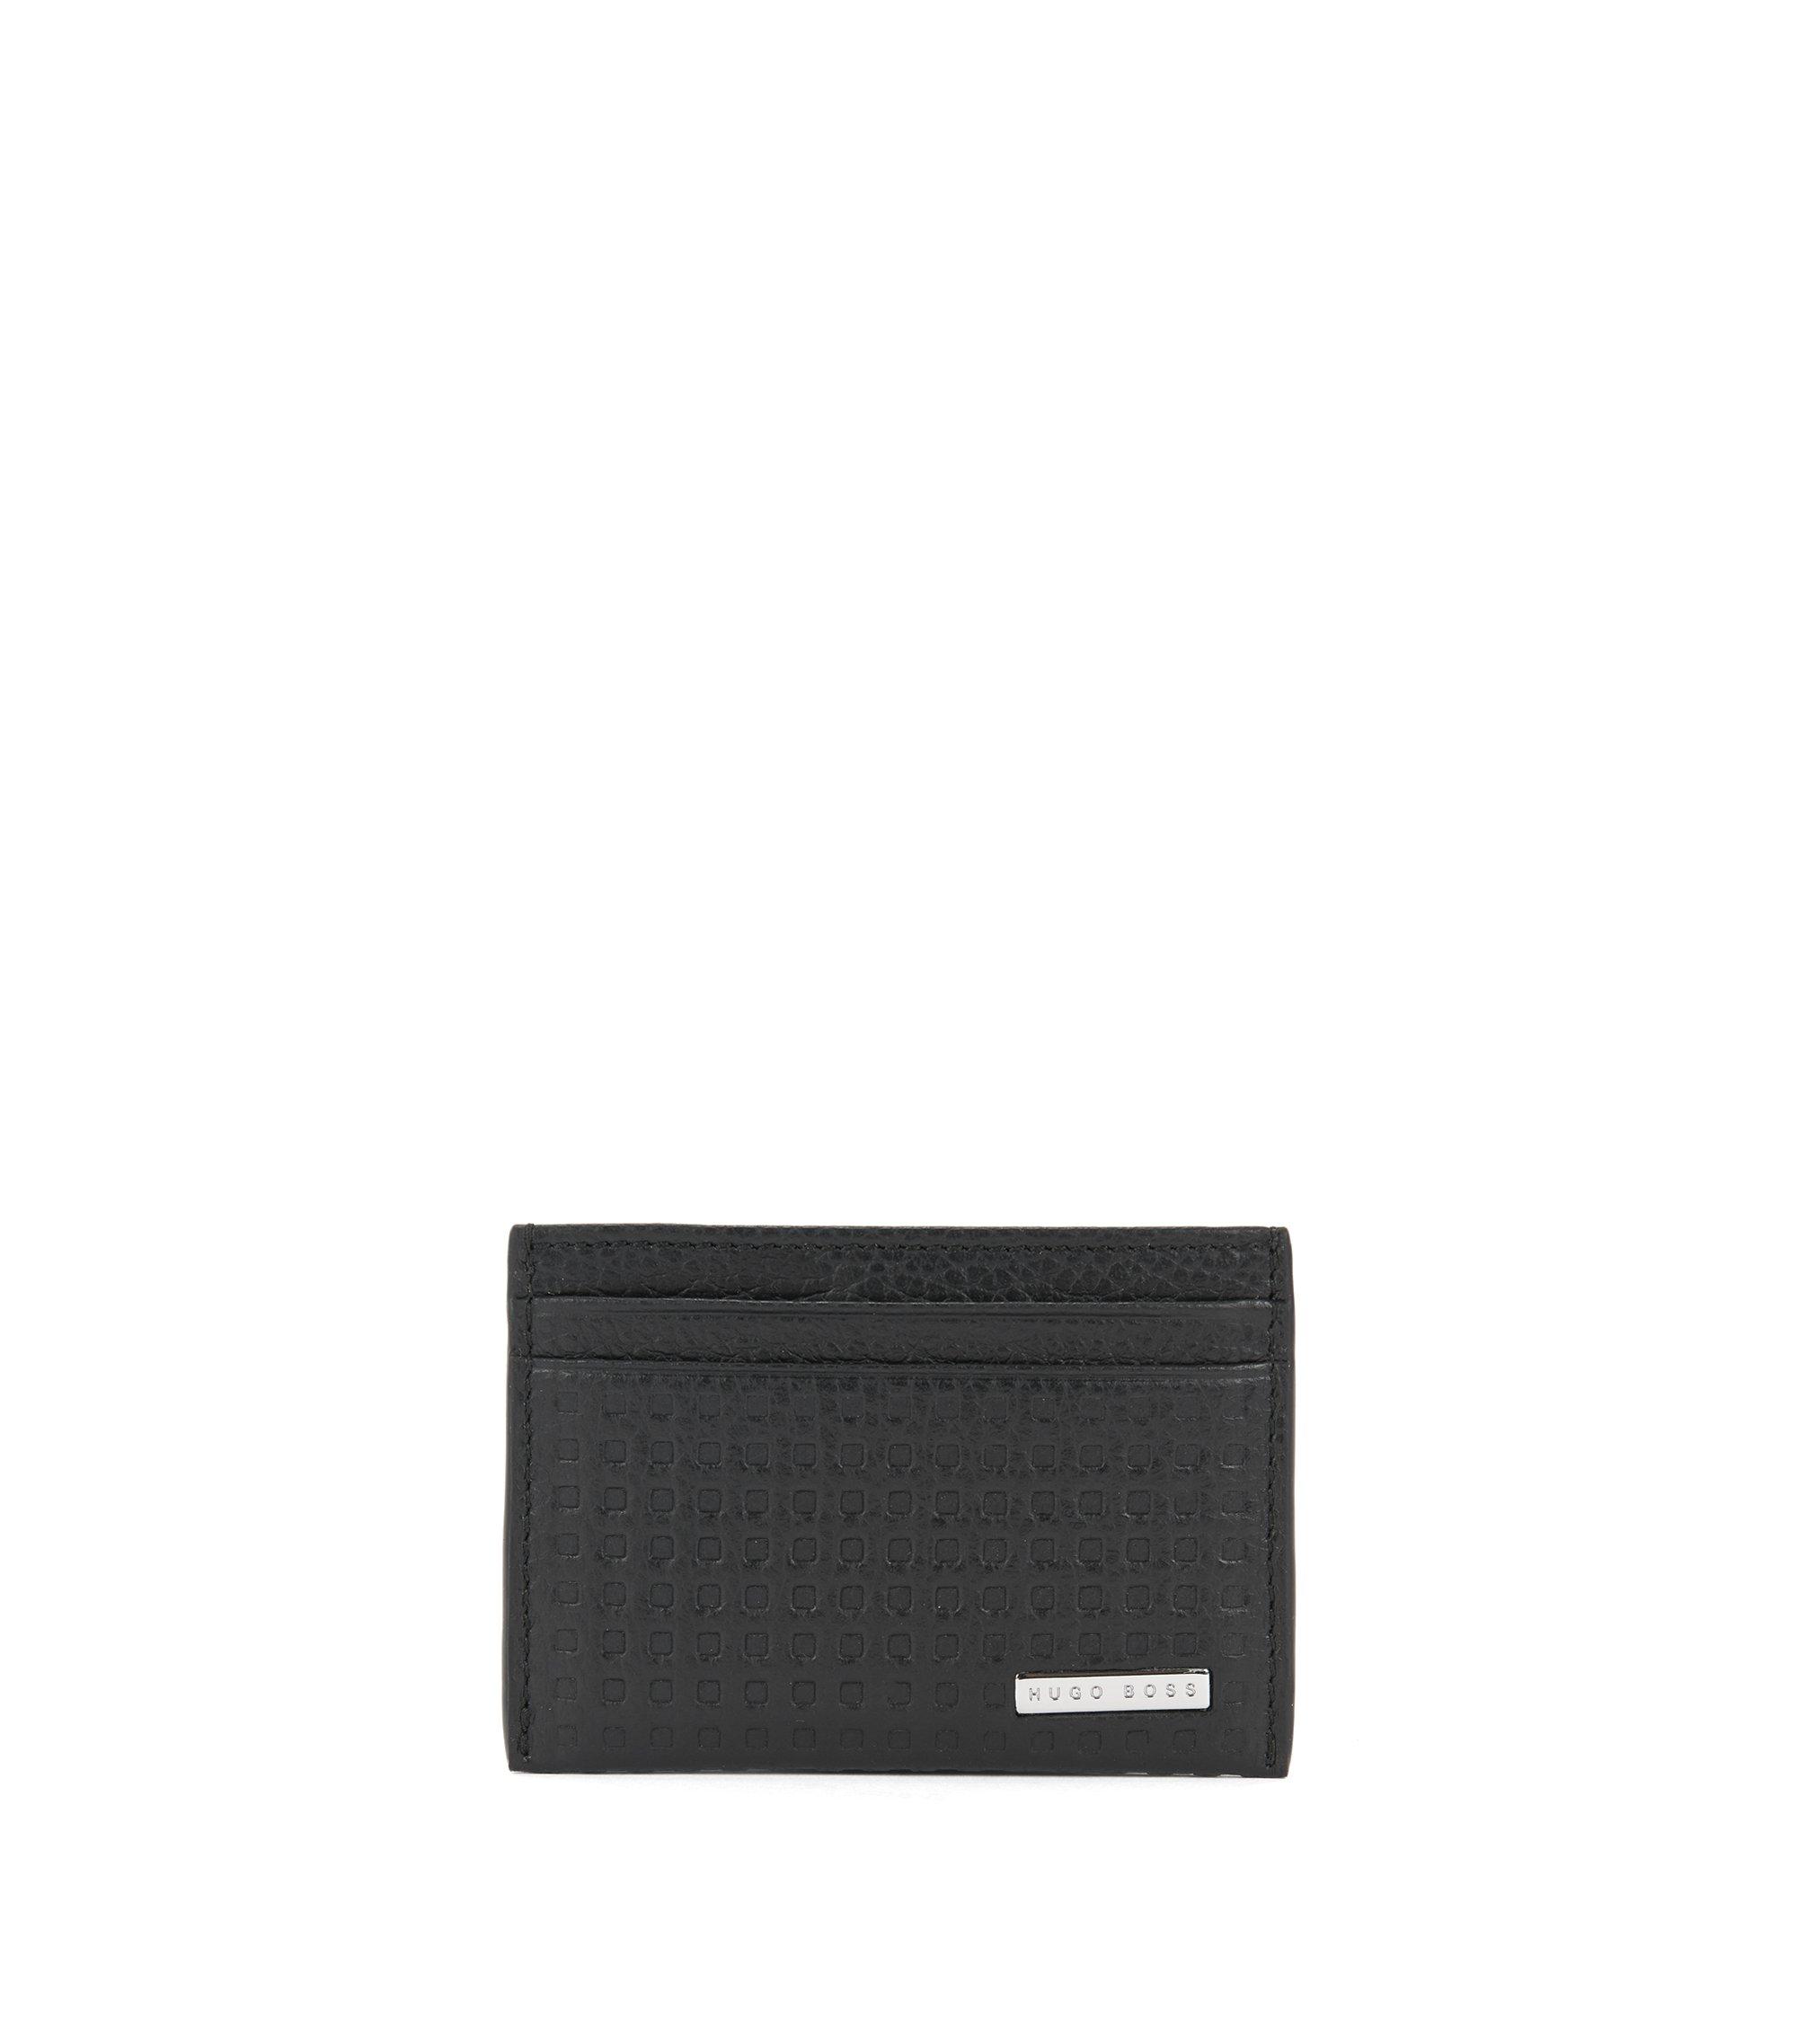 Leather Card Holder | Marseille S Card, Black